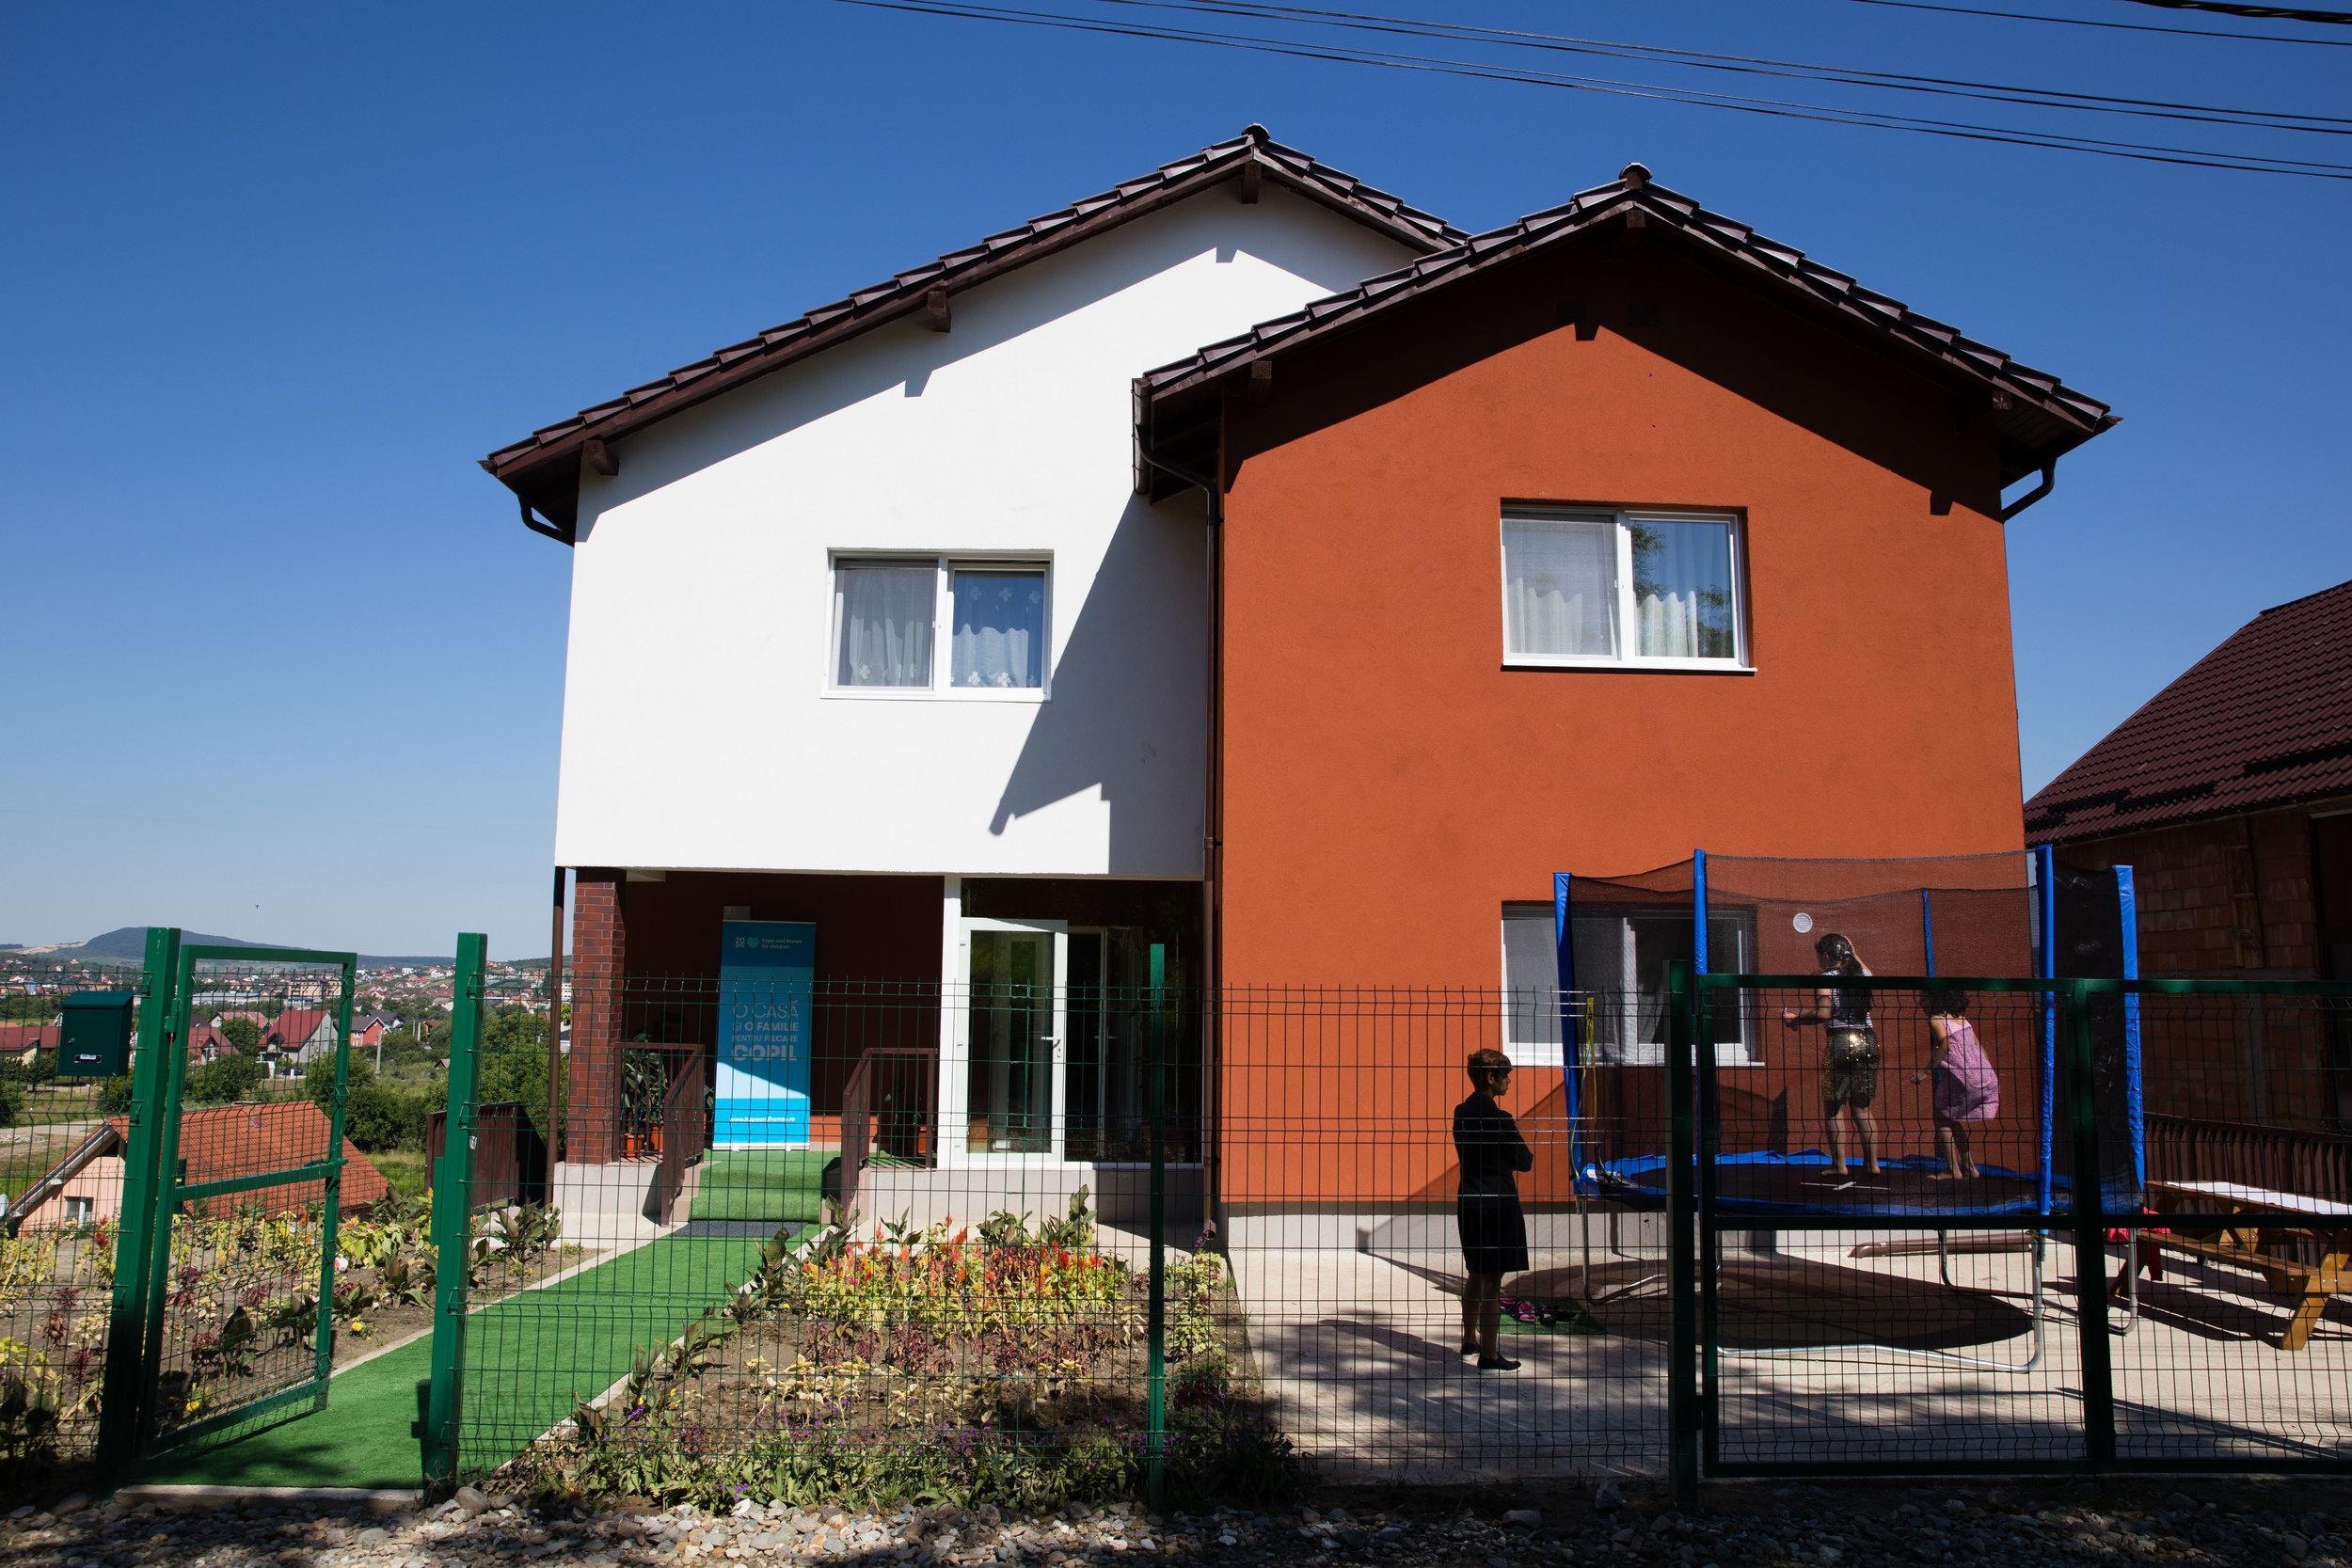 Casa de tip familial Bistrita_01_Foto Diana Sandor.jpg